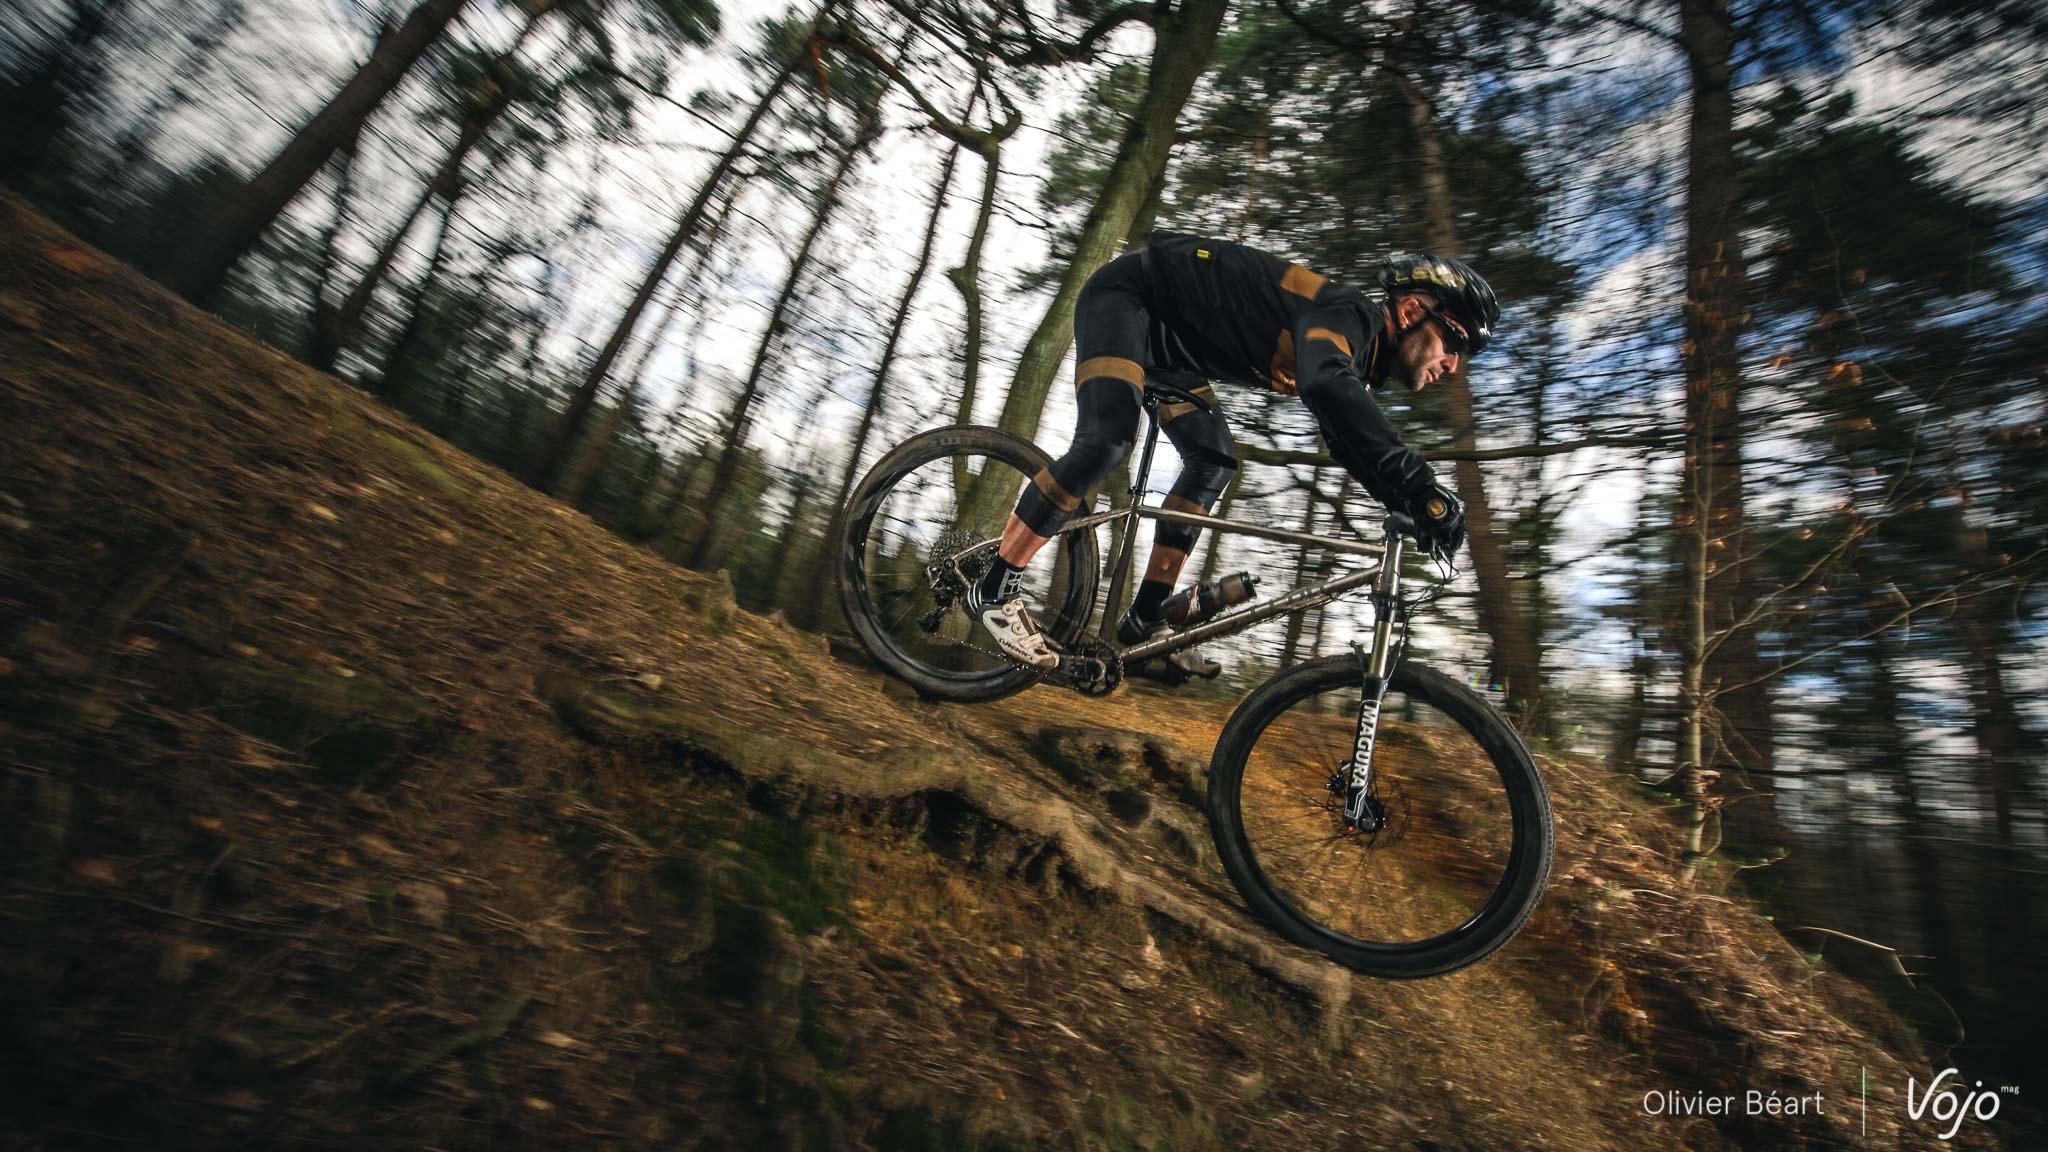 cycles_leon_decouverte_copyright_obeart_vojomag-61